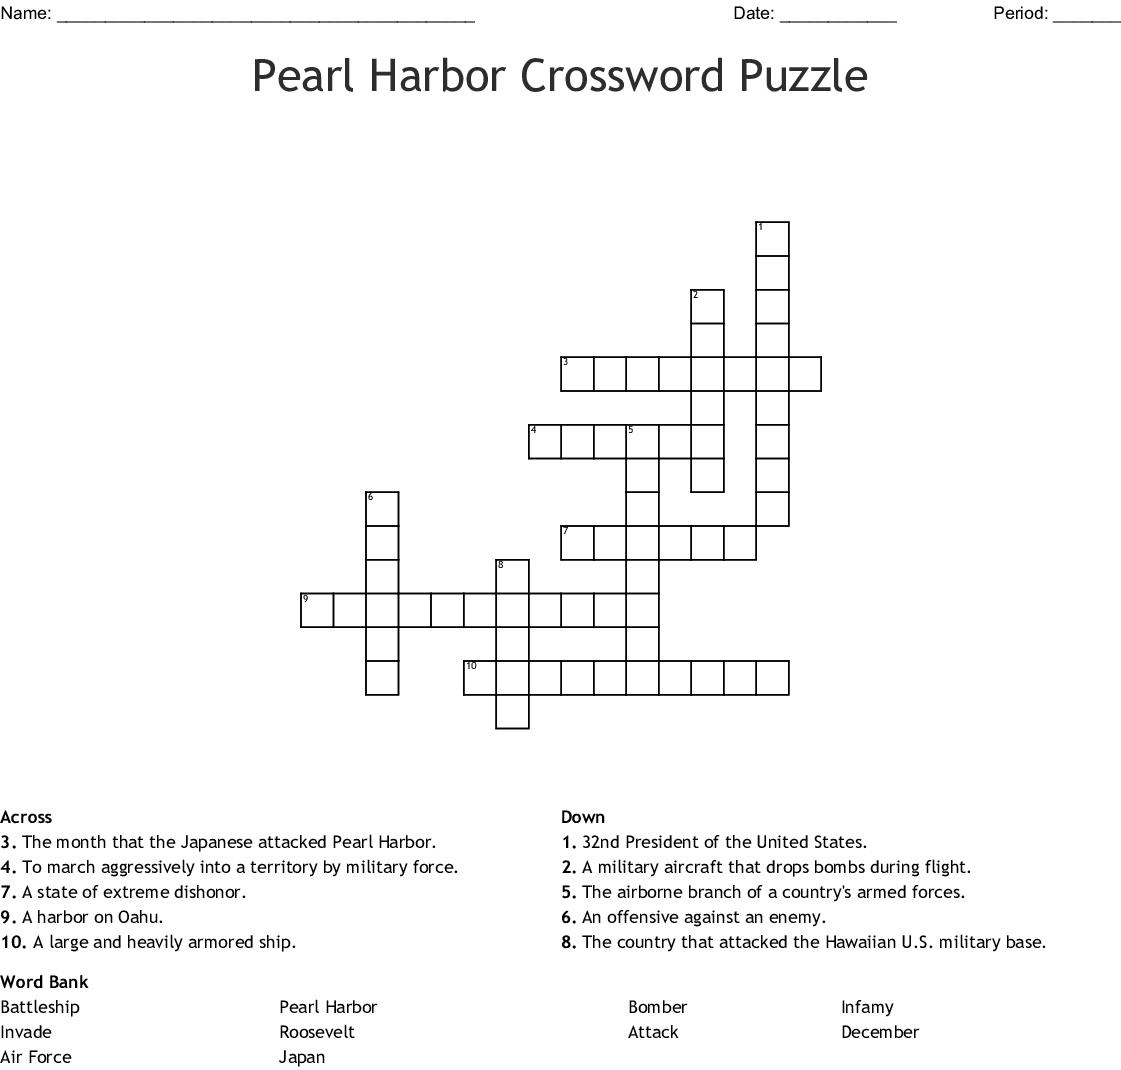 Pearl Harbor Crossword